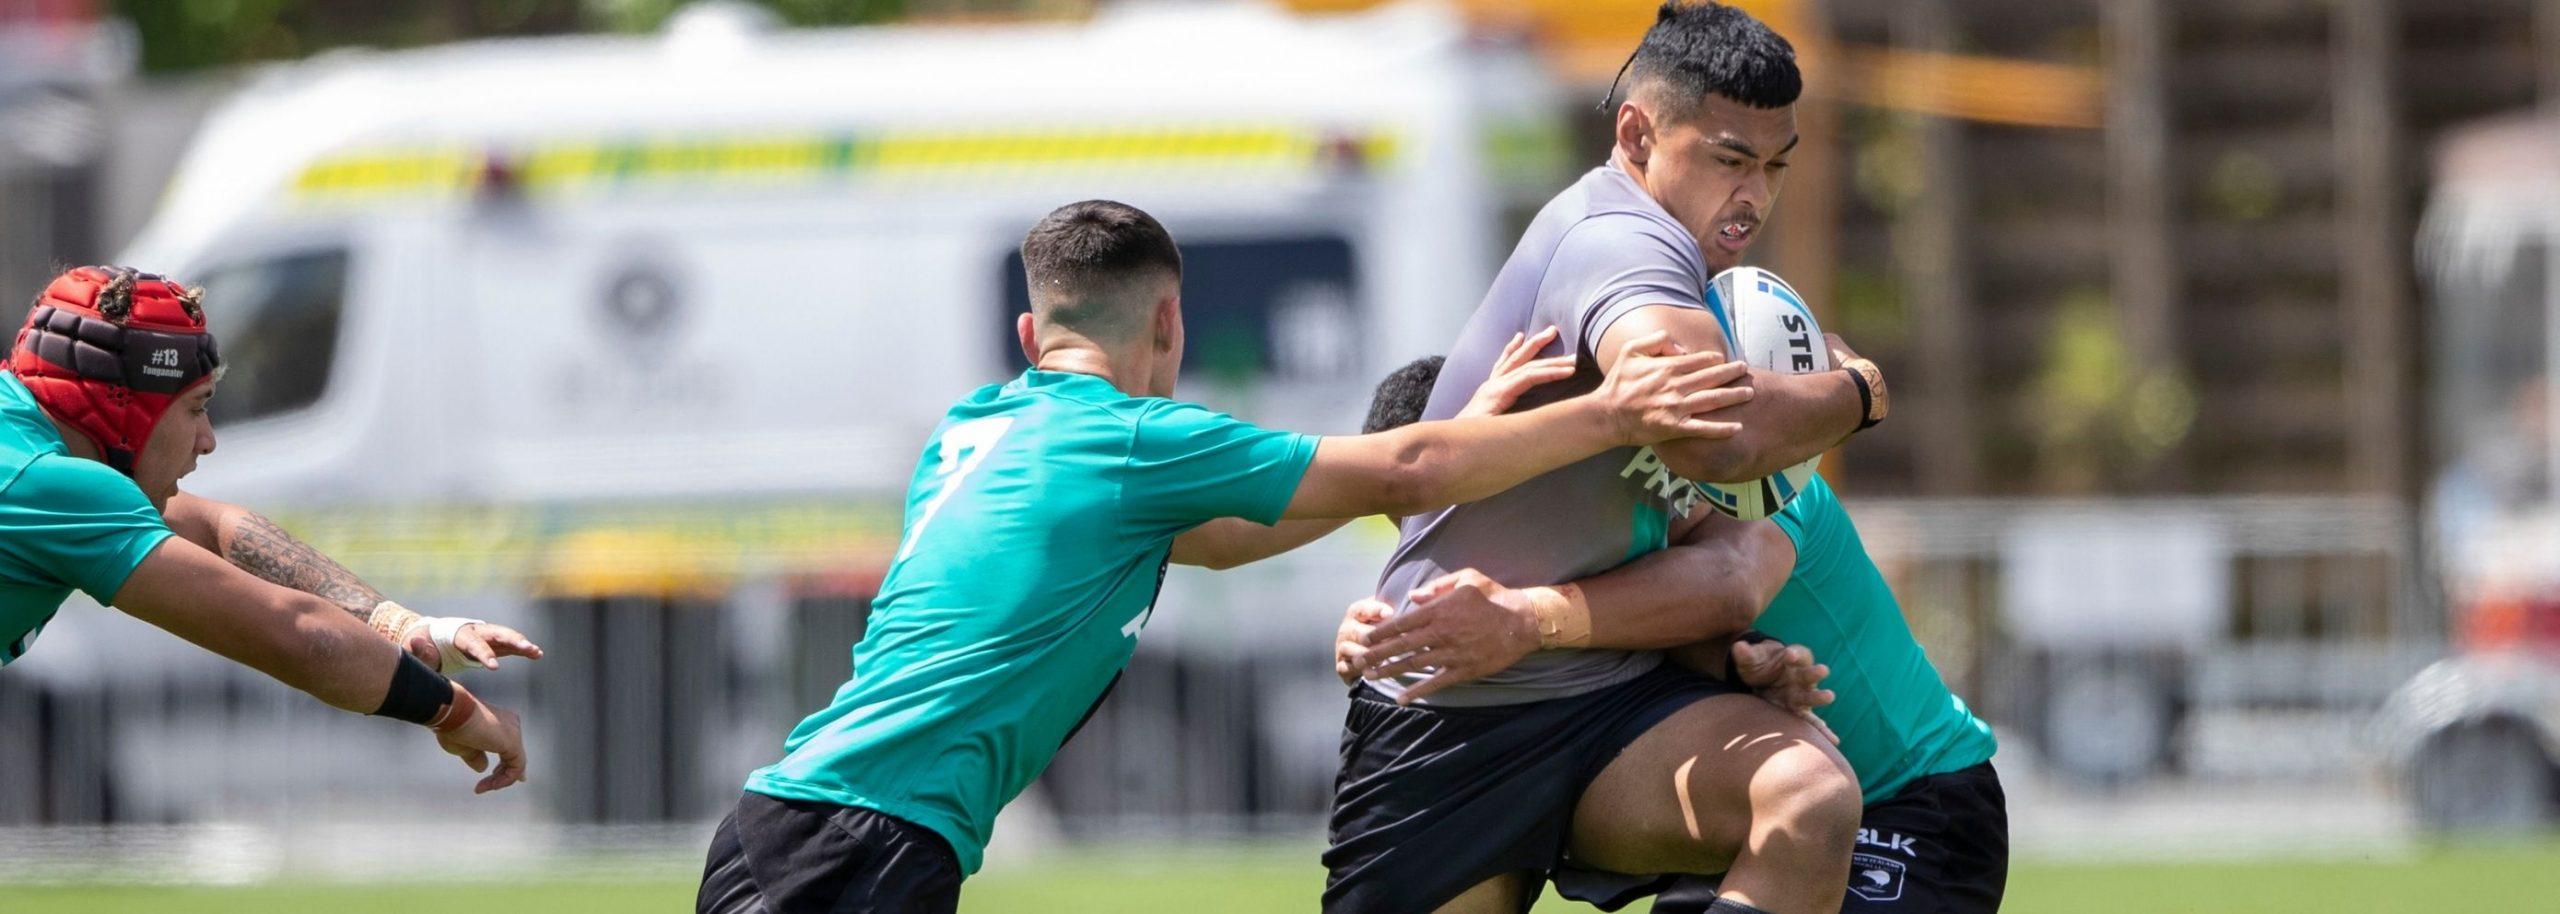 Clubs win inaugural NZRL Clubs v Schools clash